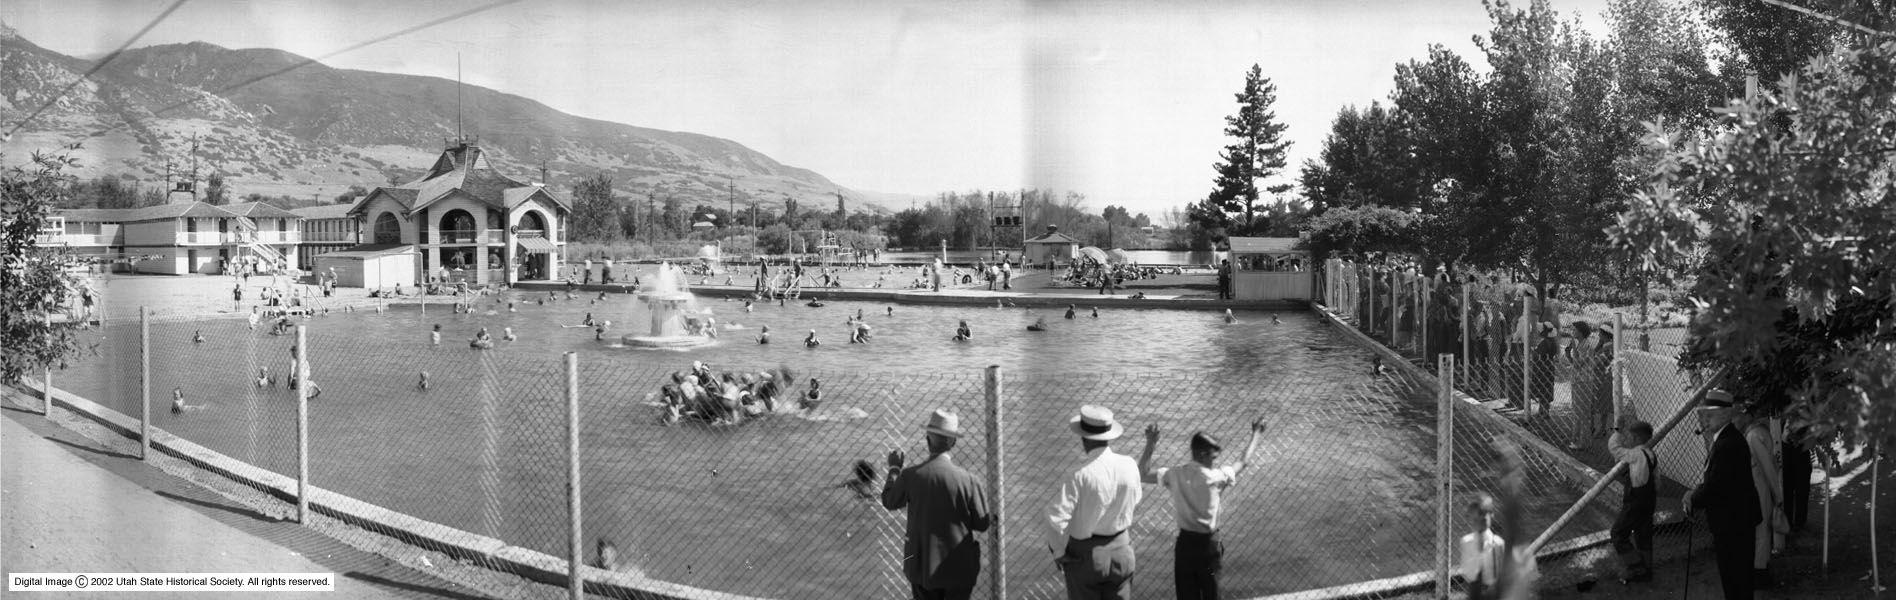 Lagoon Swimming Pool Farmington Utah 1930 Hearts Of The Children Pinterest Utah